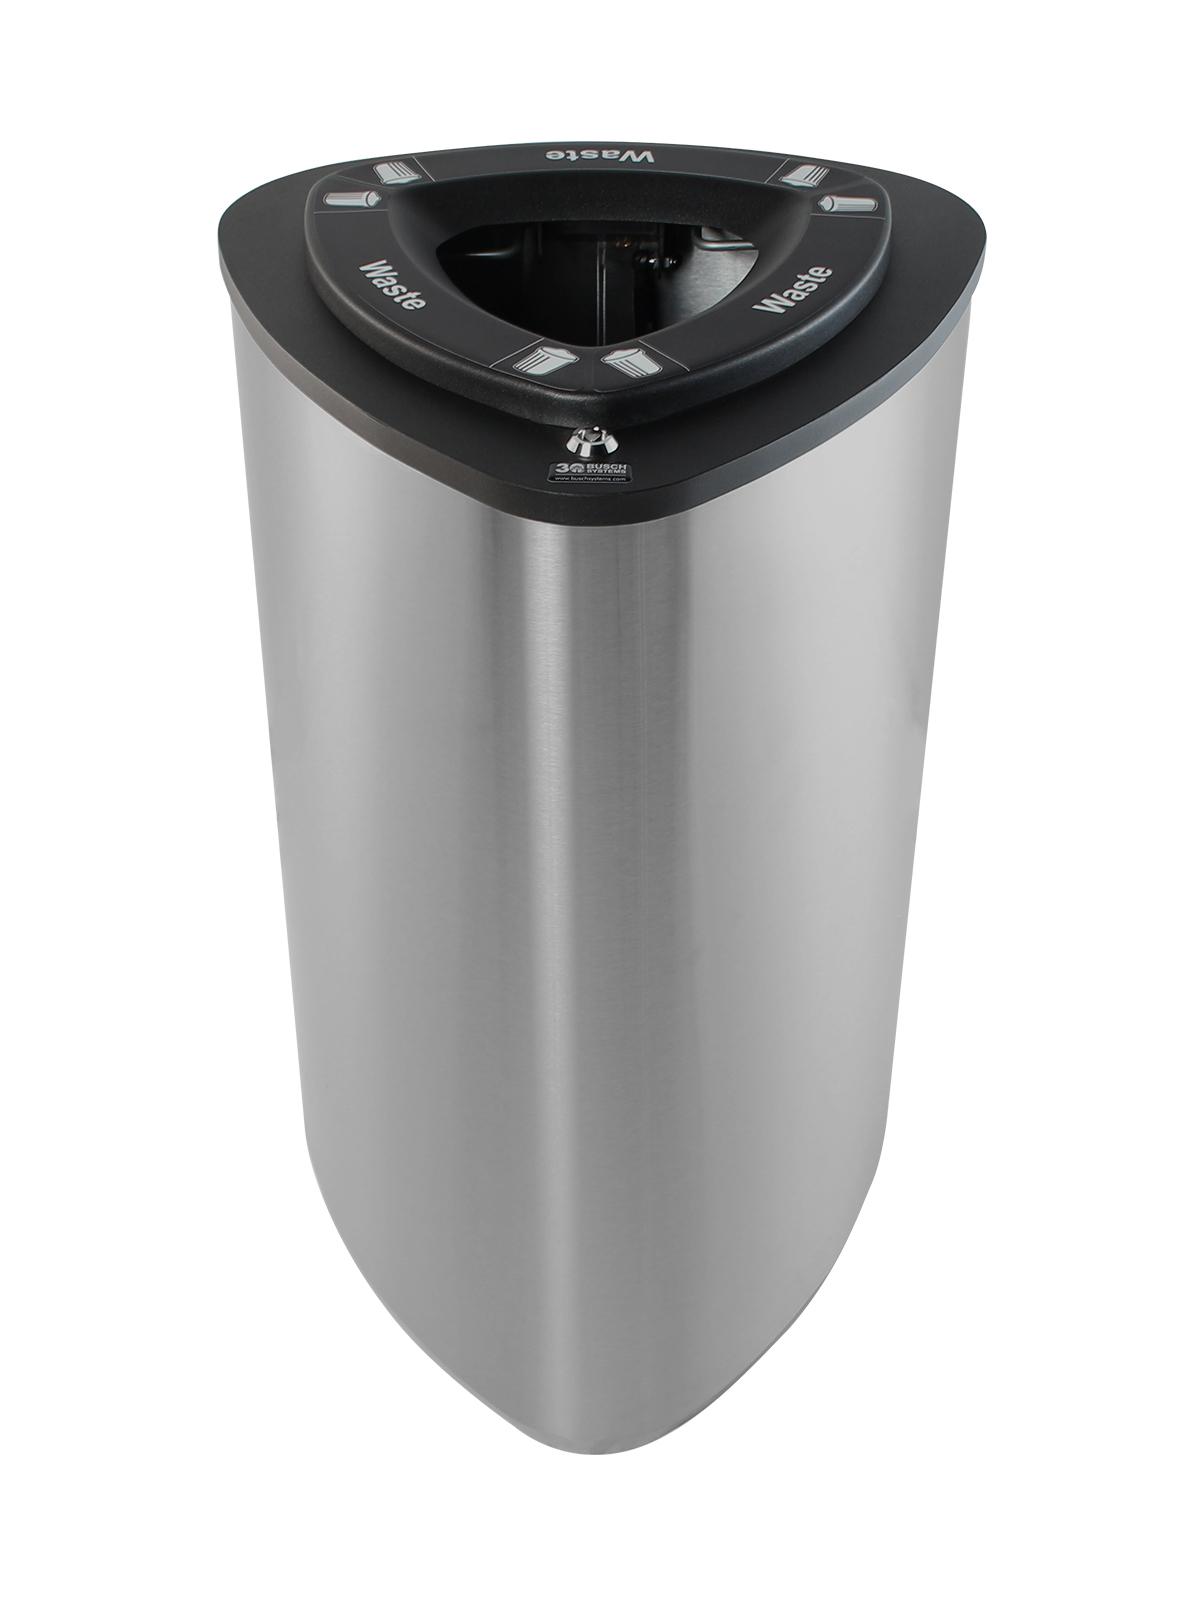 BOKA - Single - Xl - Waste - Full - Stainless Steel